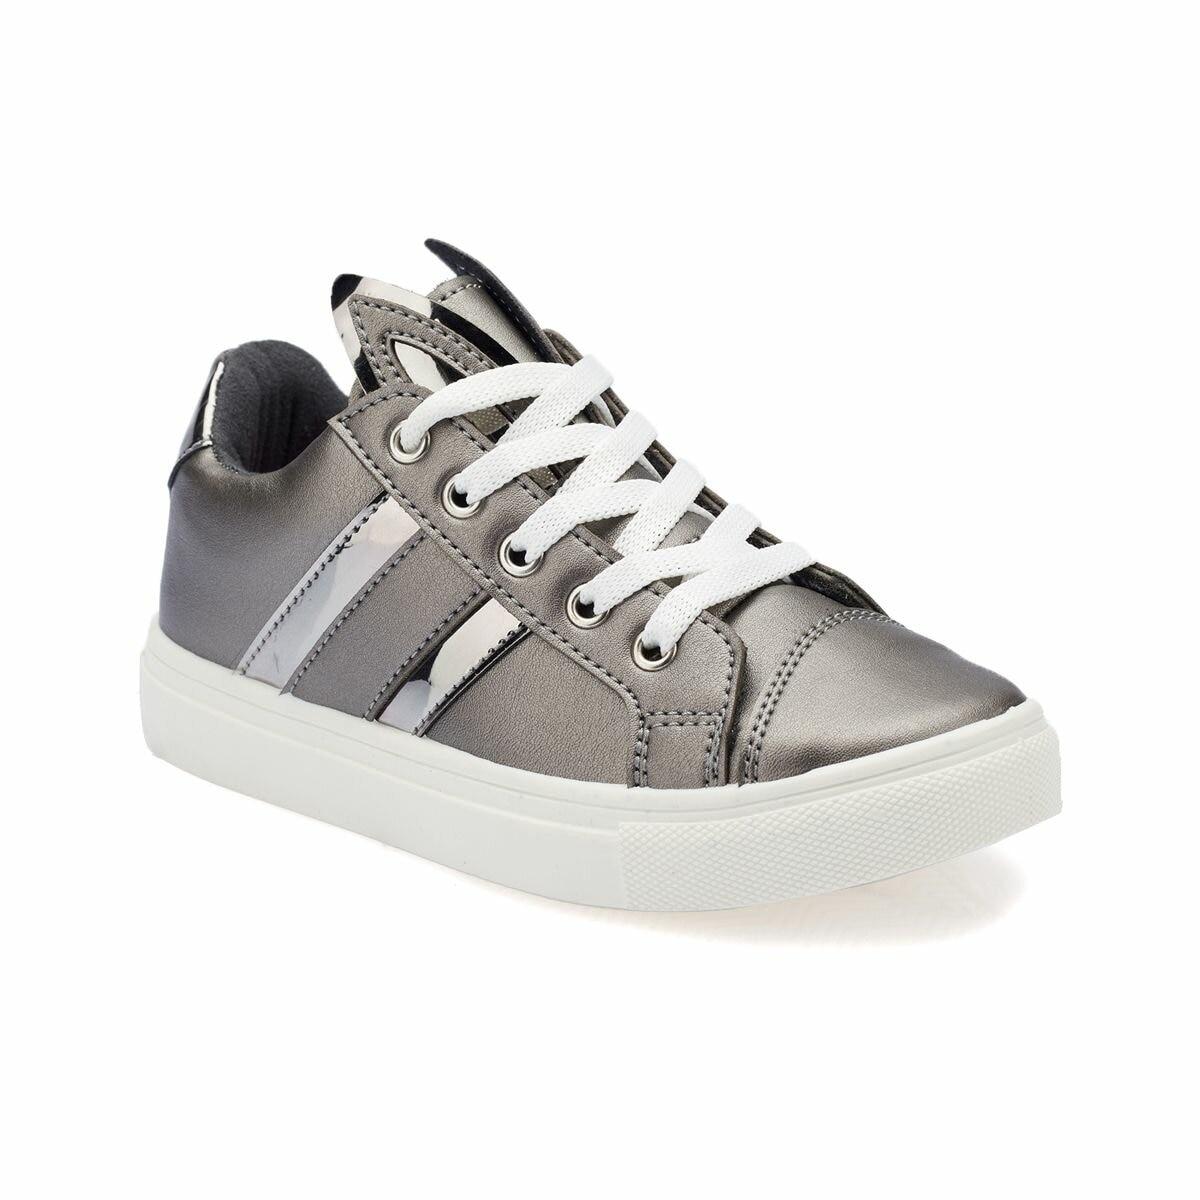 FLO 82.510744.P Silver Female Child Sneaker Shoes Polaris